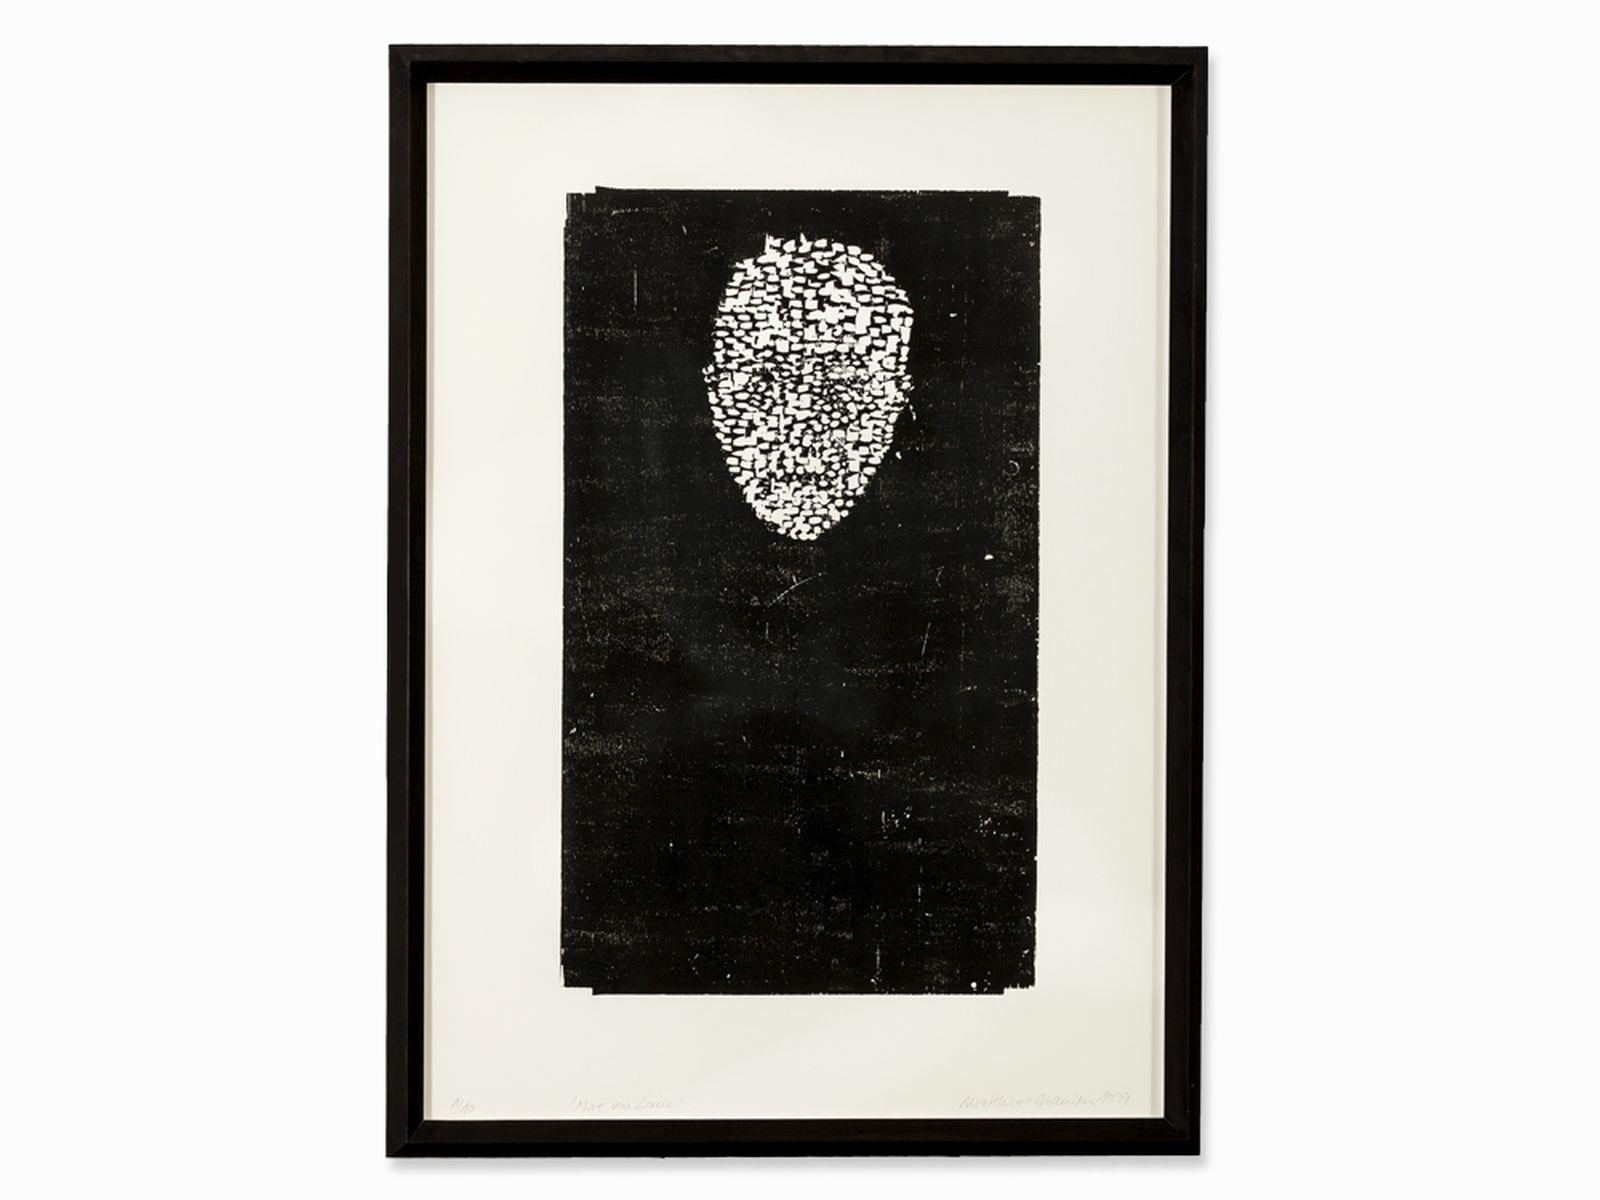 #50 Matthias Mansen (b. 1958), Max von Laue, Woodcut, 1999   Matthias Mansen (geb. 1958) Image